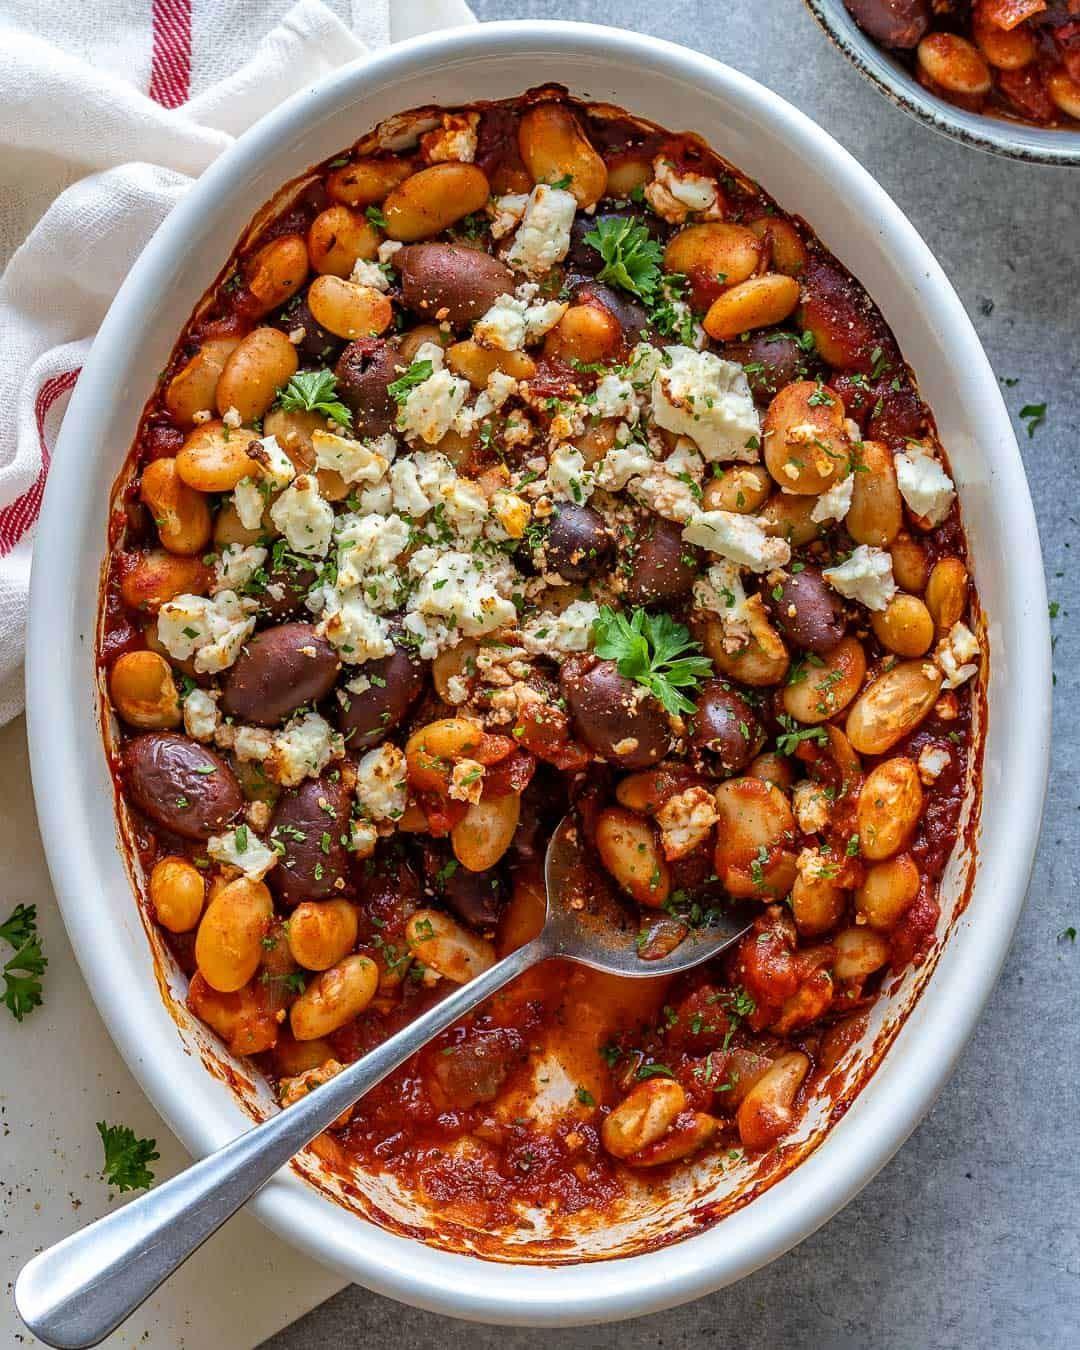 Greek Baked Beans Recipe In 2021 Bean Recipes Baked Beans Baked Bean Recipes